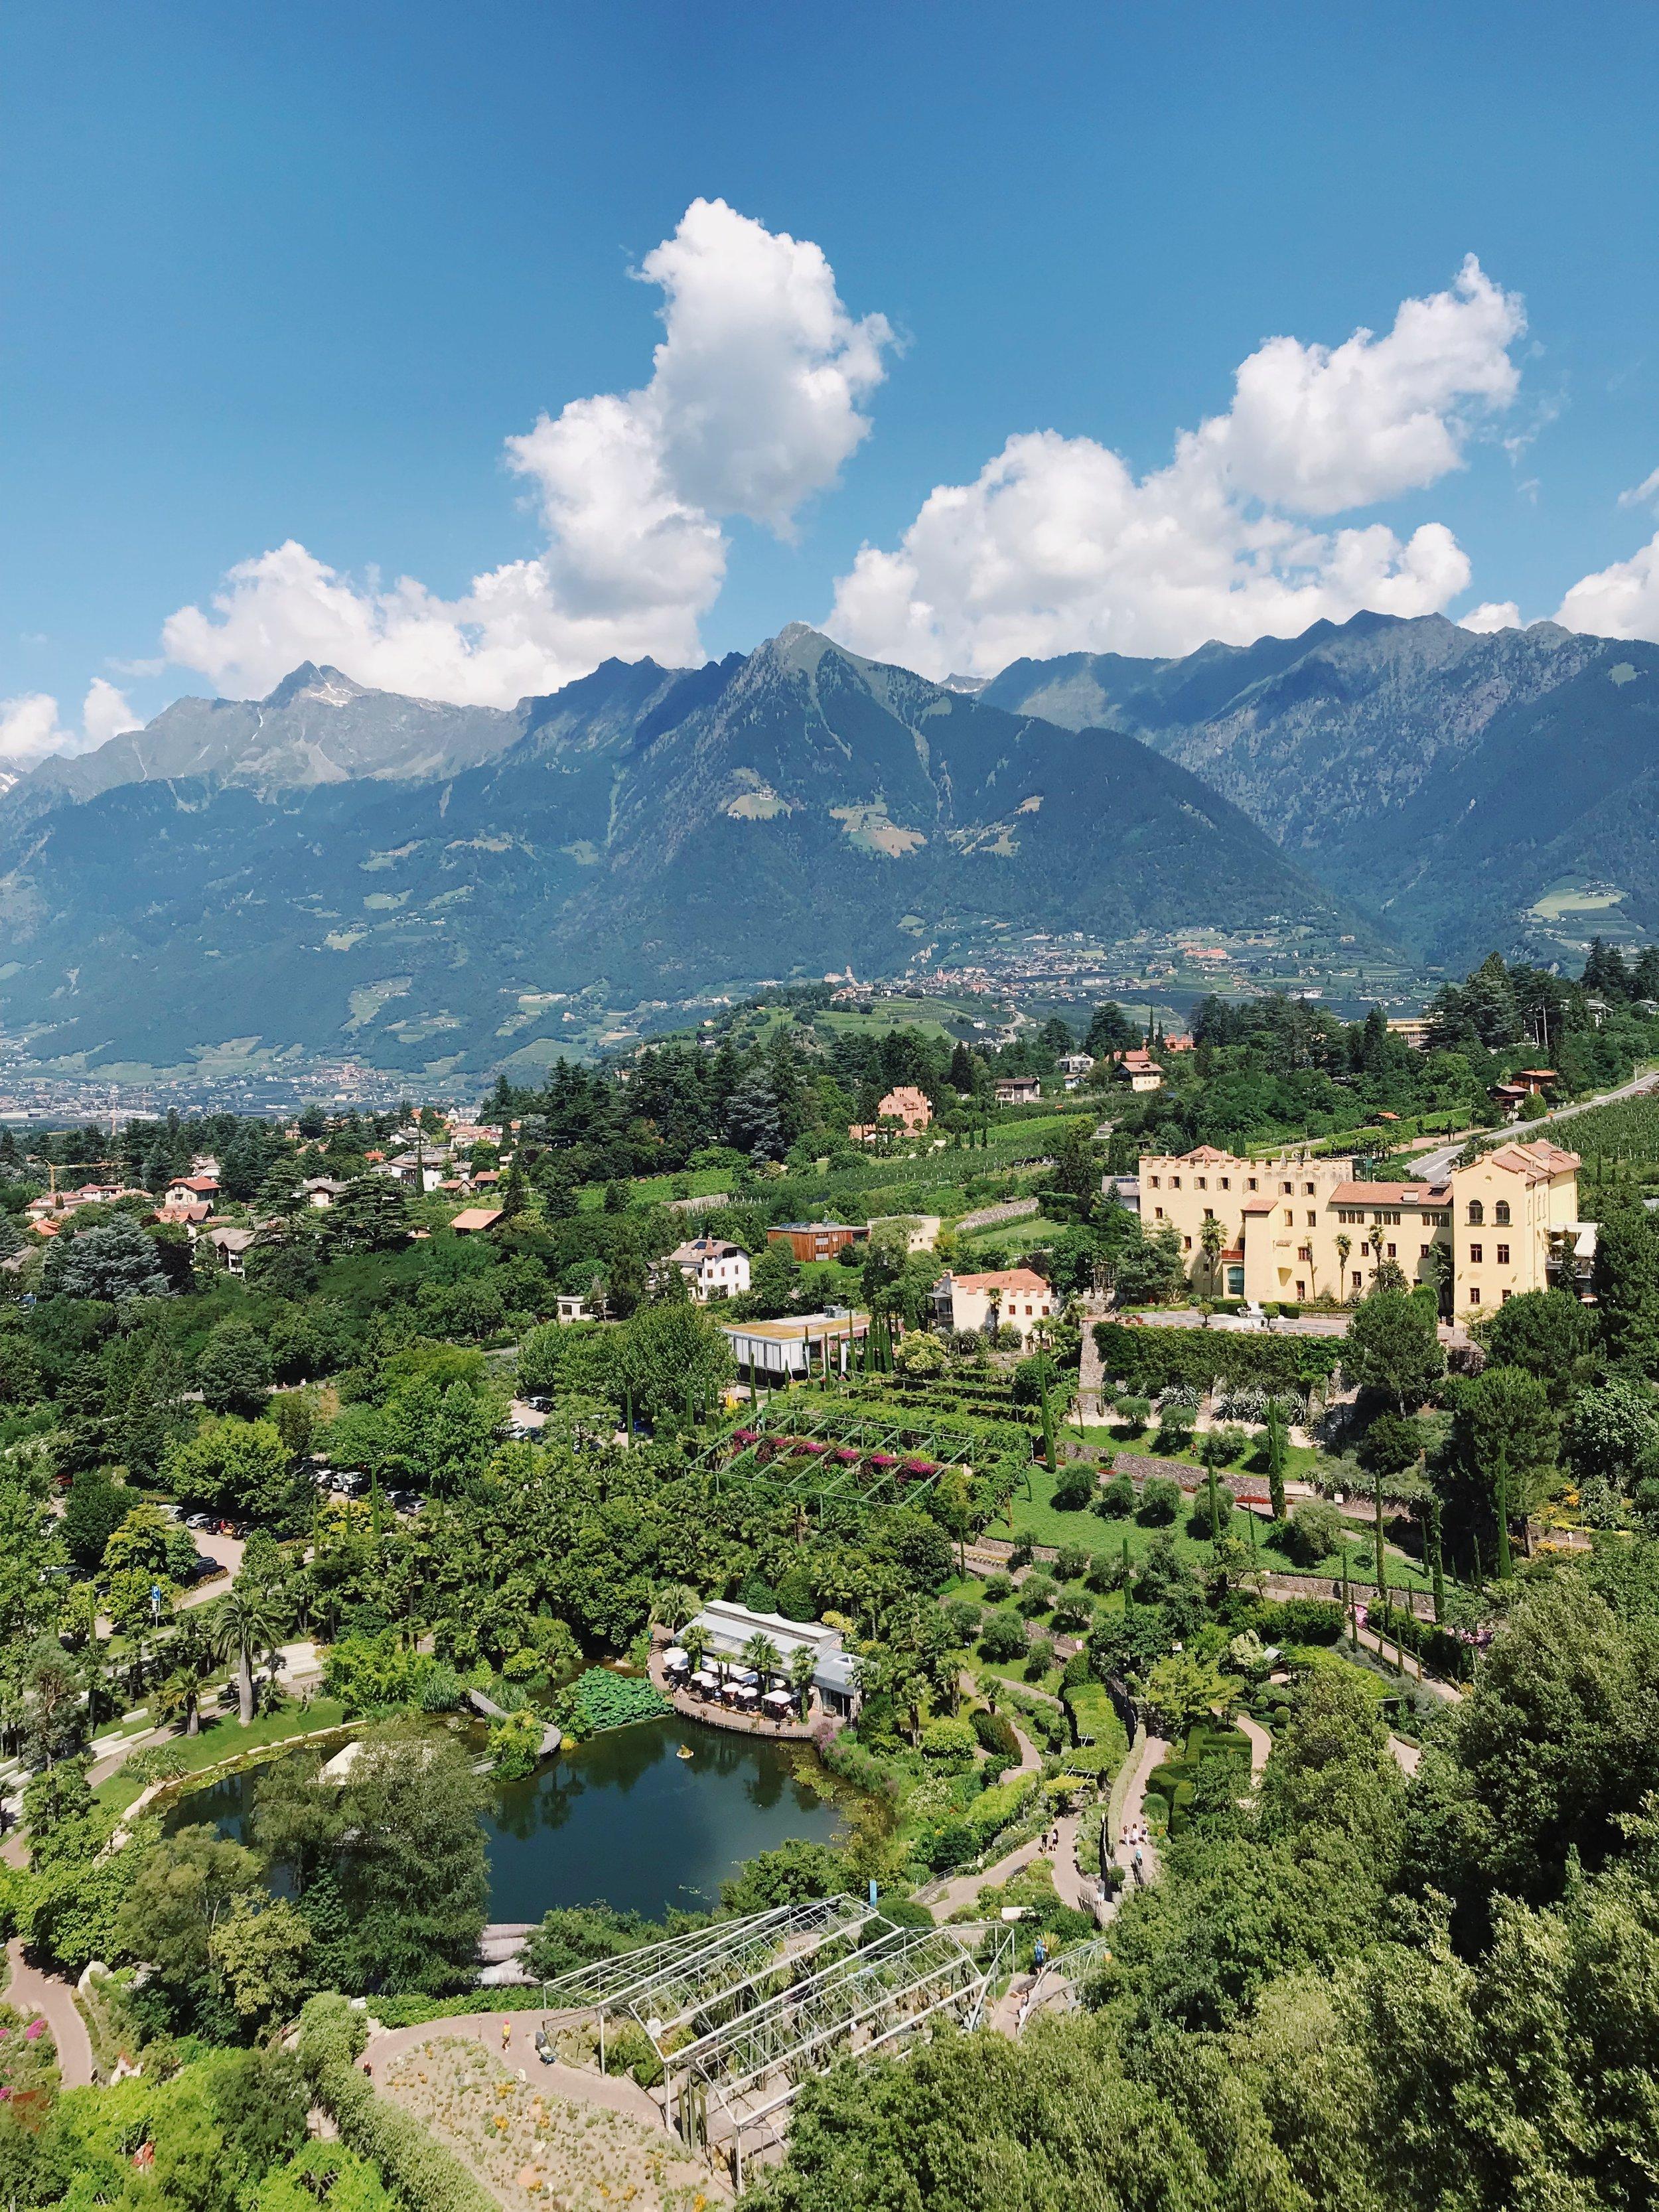 The Valley of Merano.